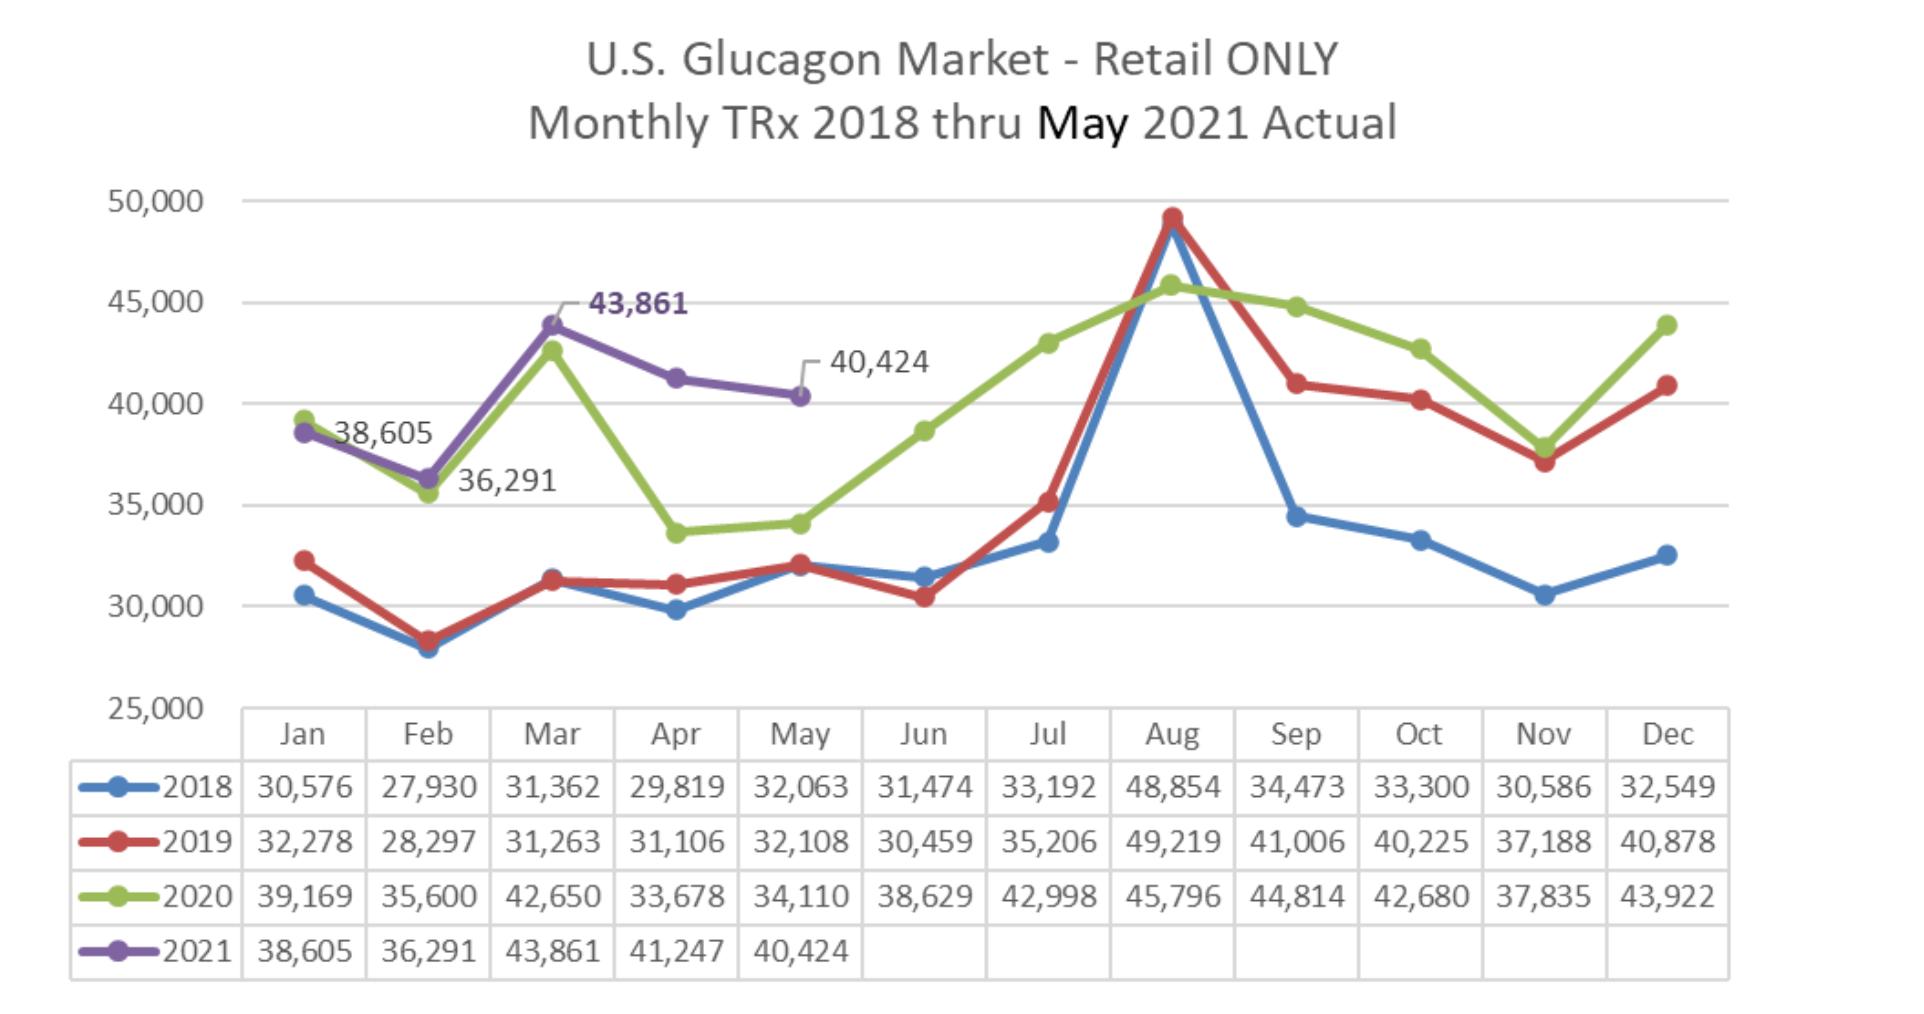 U.S. Glucagon Market